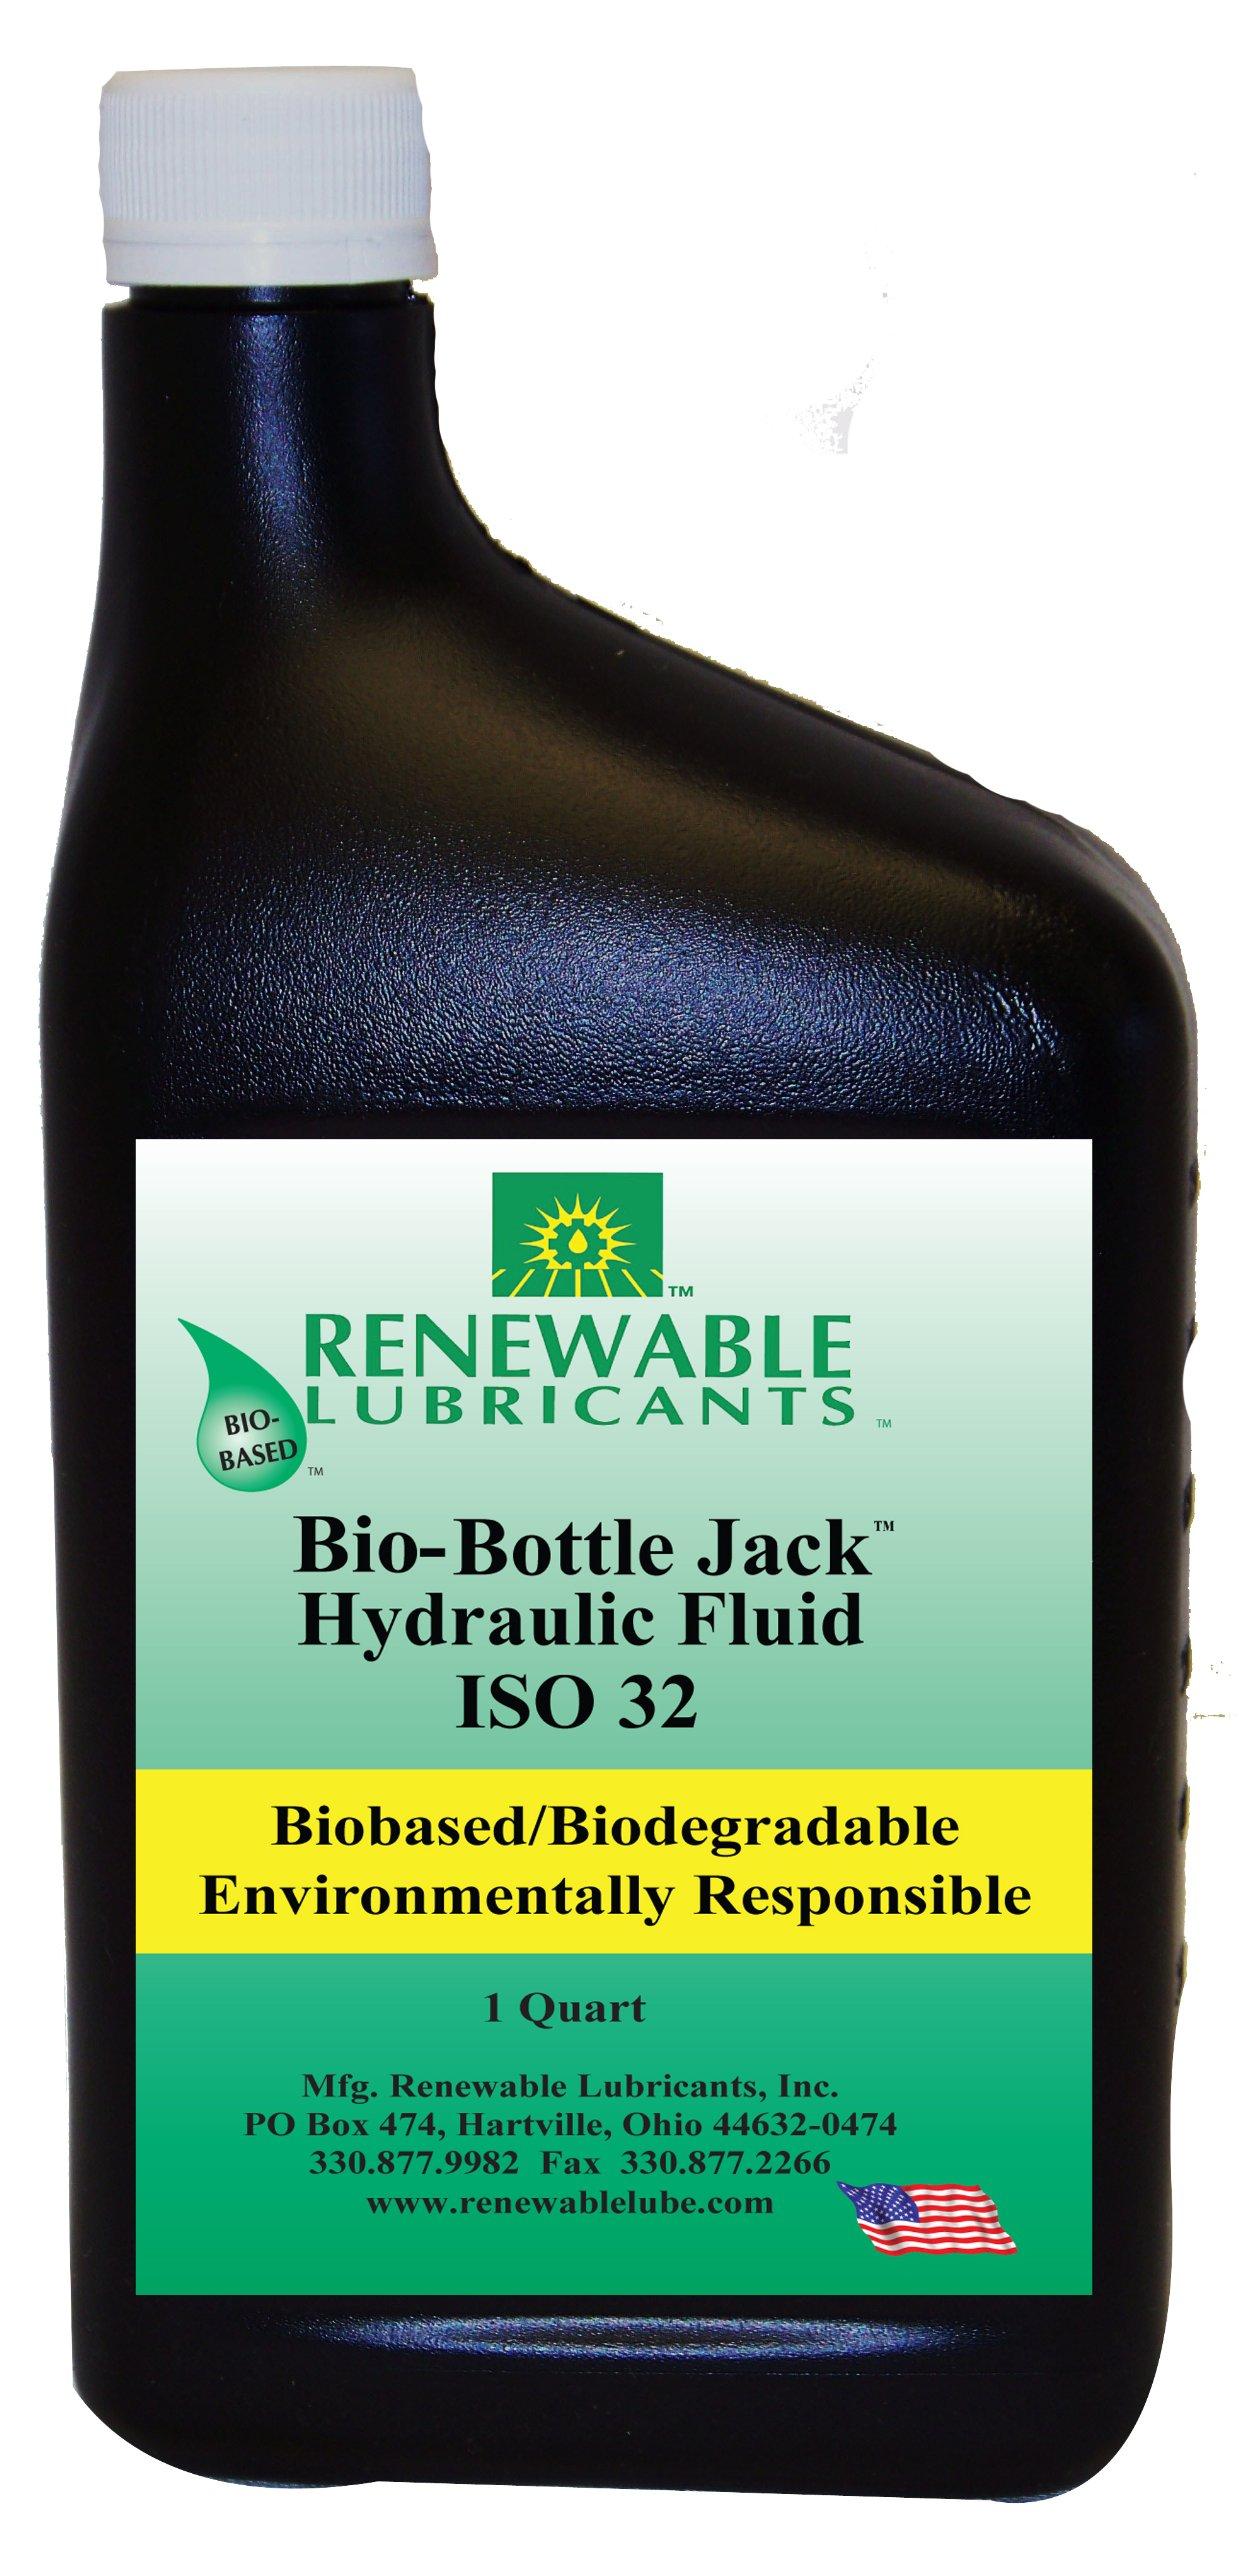 Renewable Lubricants Bio-Bottle Jack ISO 32 Hydraulic Lubricant, 1 qt Bottle